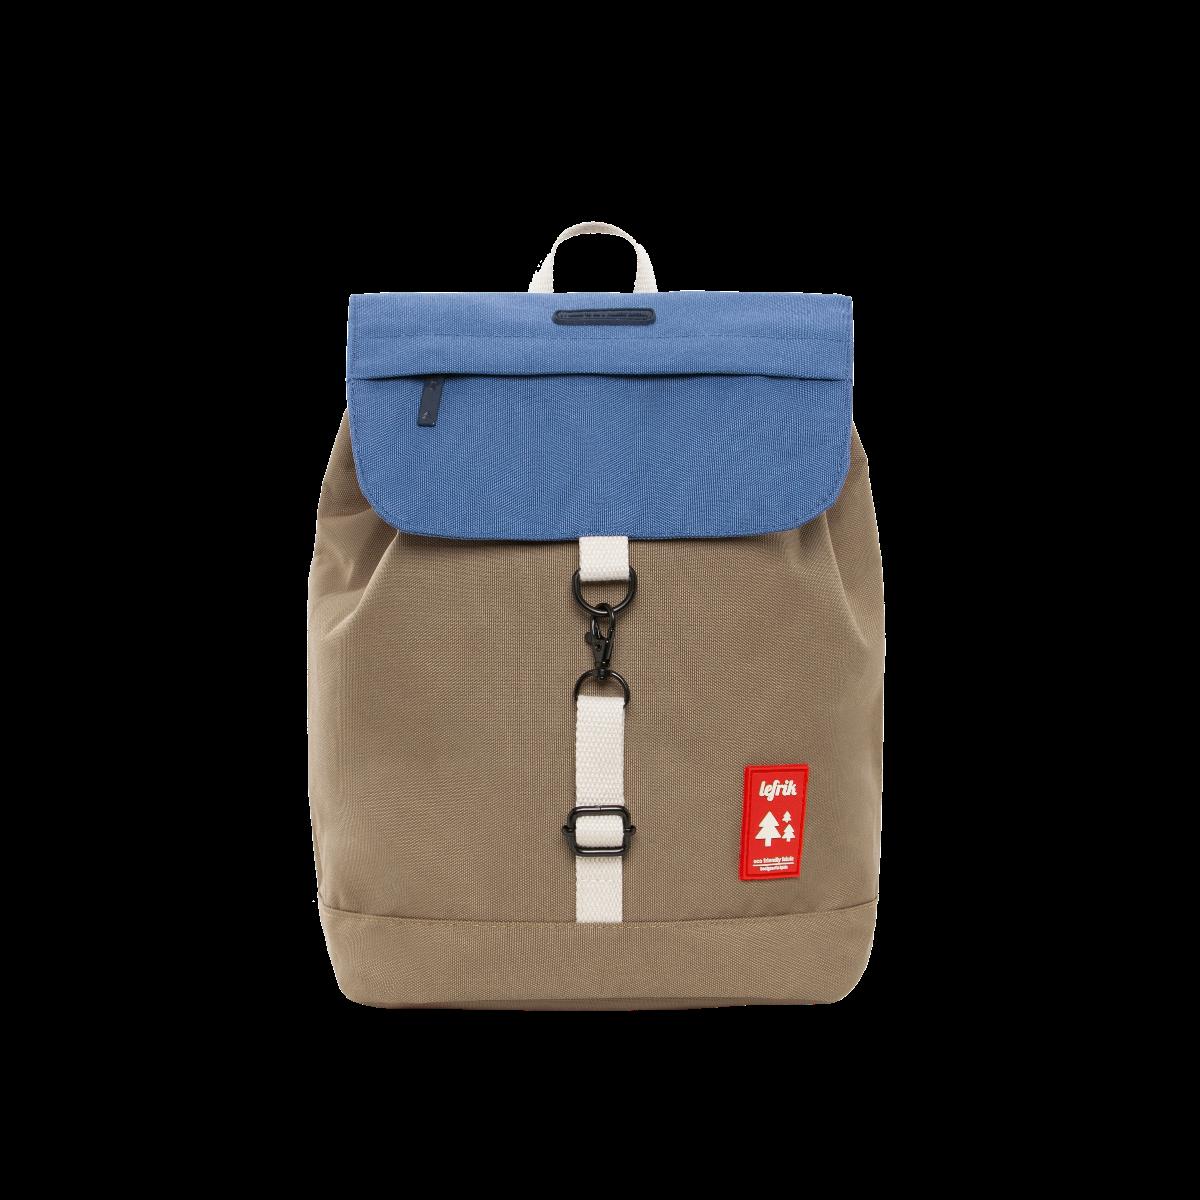 Lefrik Scout Mini Rucksack in Multi Ink